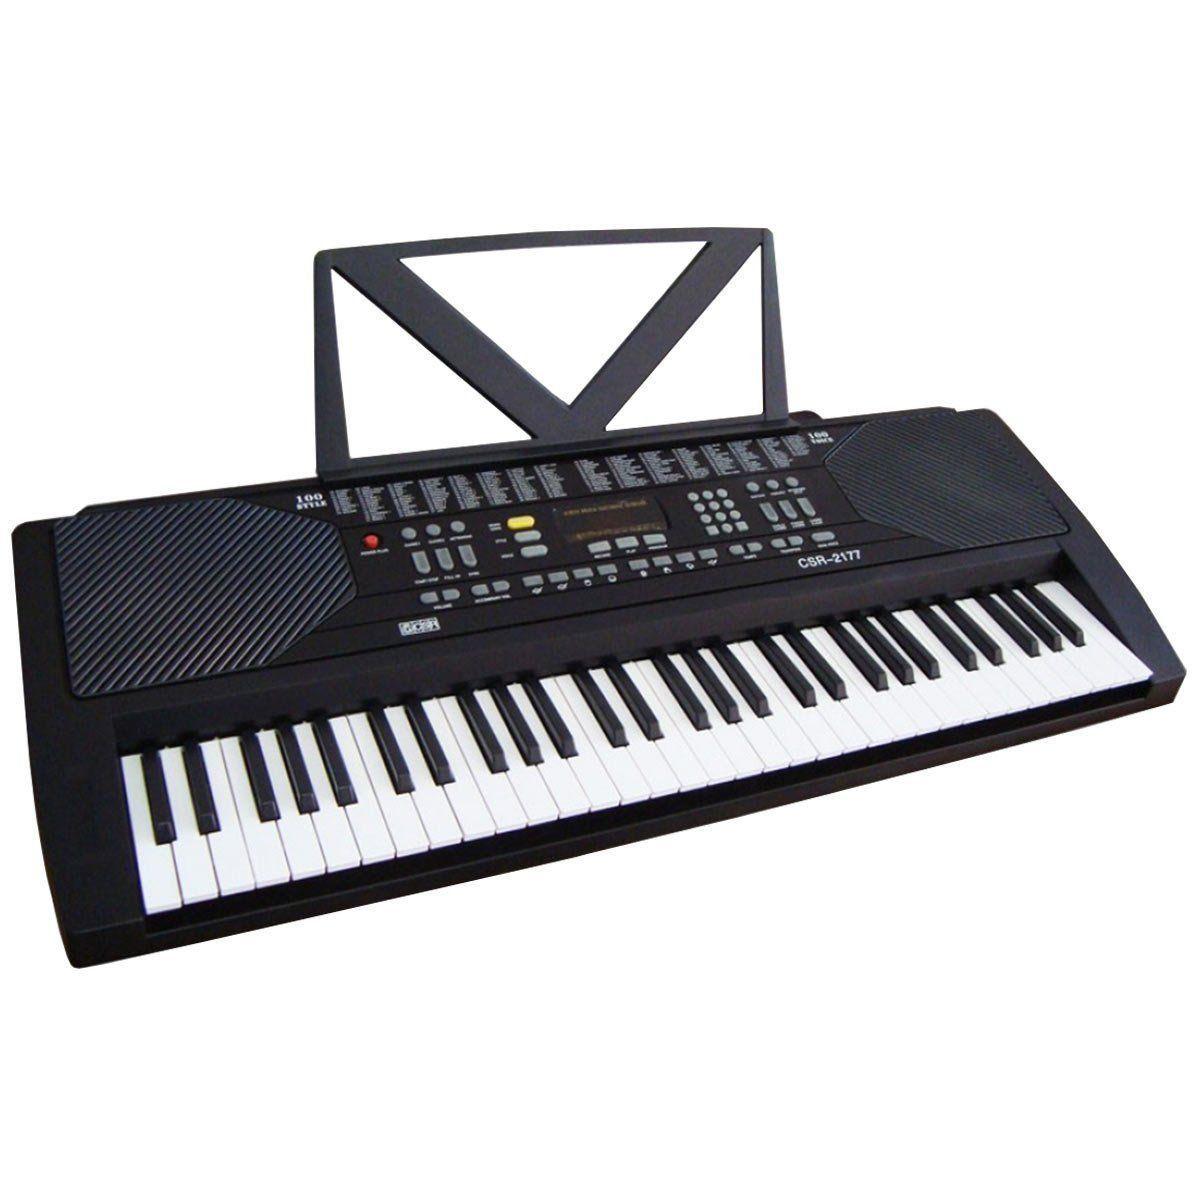 Teclado Musical 5/8 Csr 2177 61 Teclas